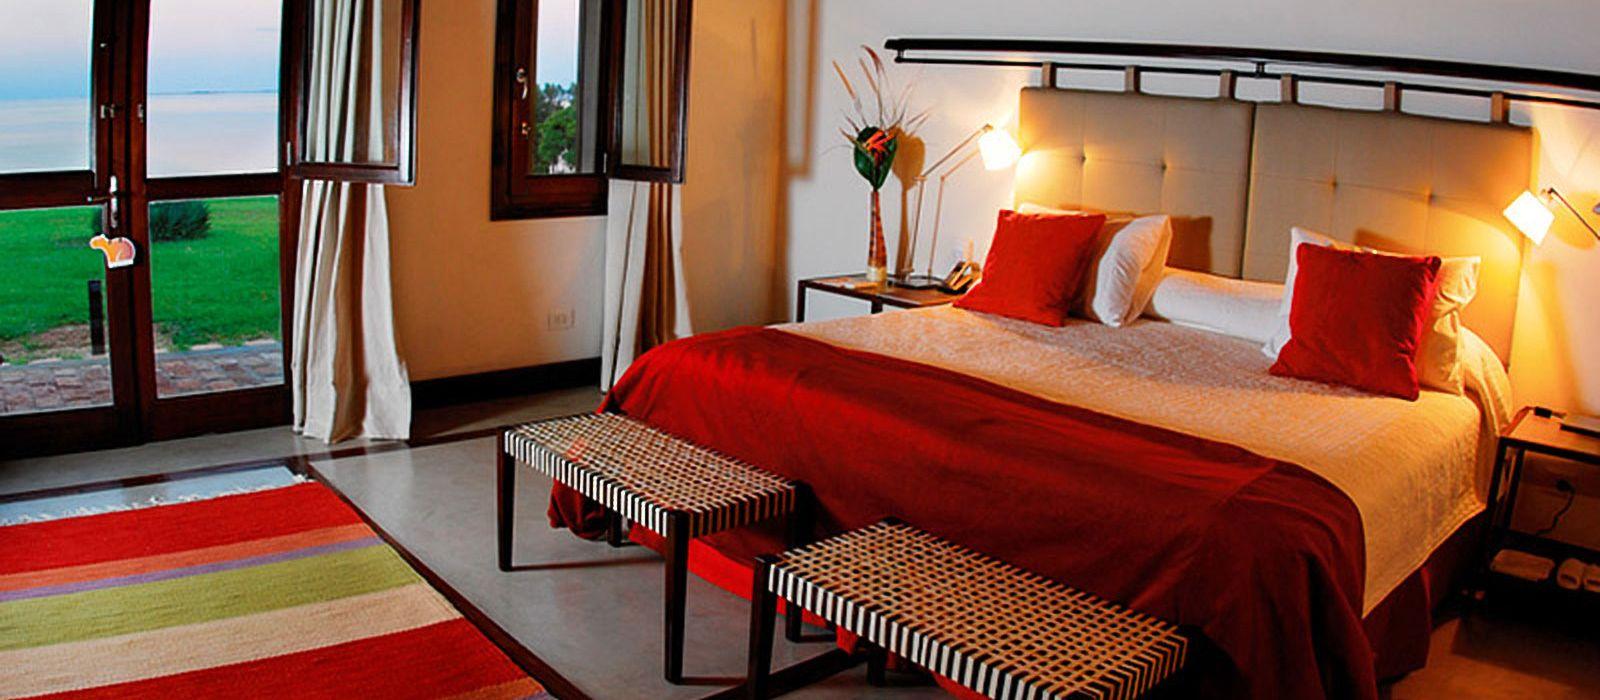 Hotel Puerto Valle Argentina